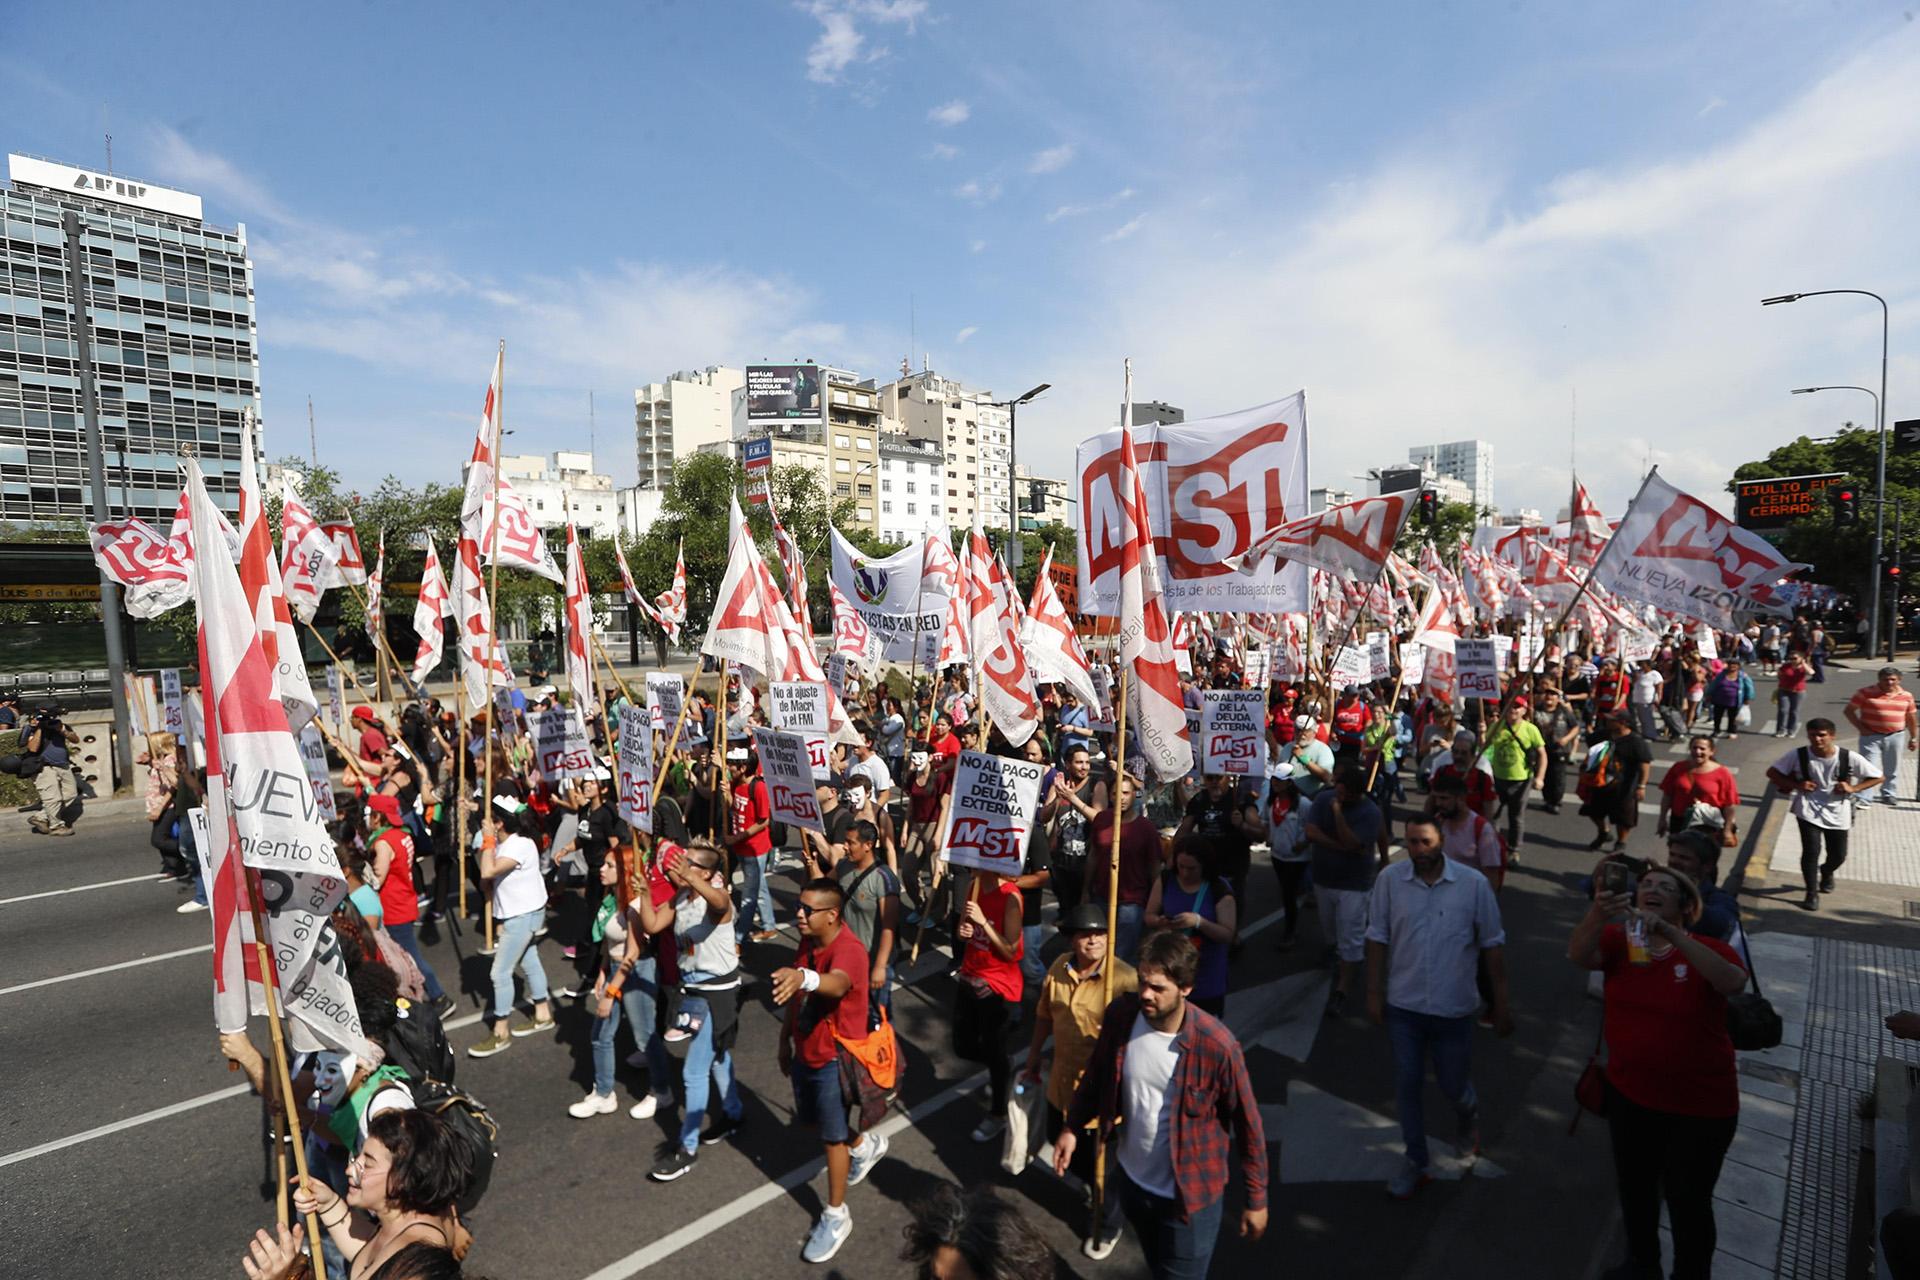 Los manifestantes marcharon por la avenida 9 de Julio